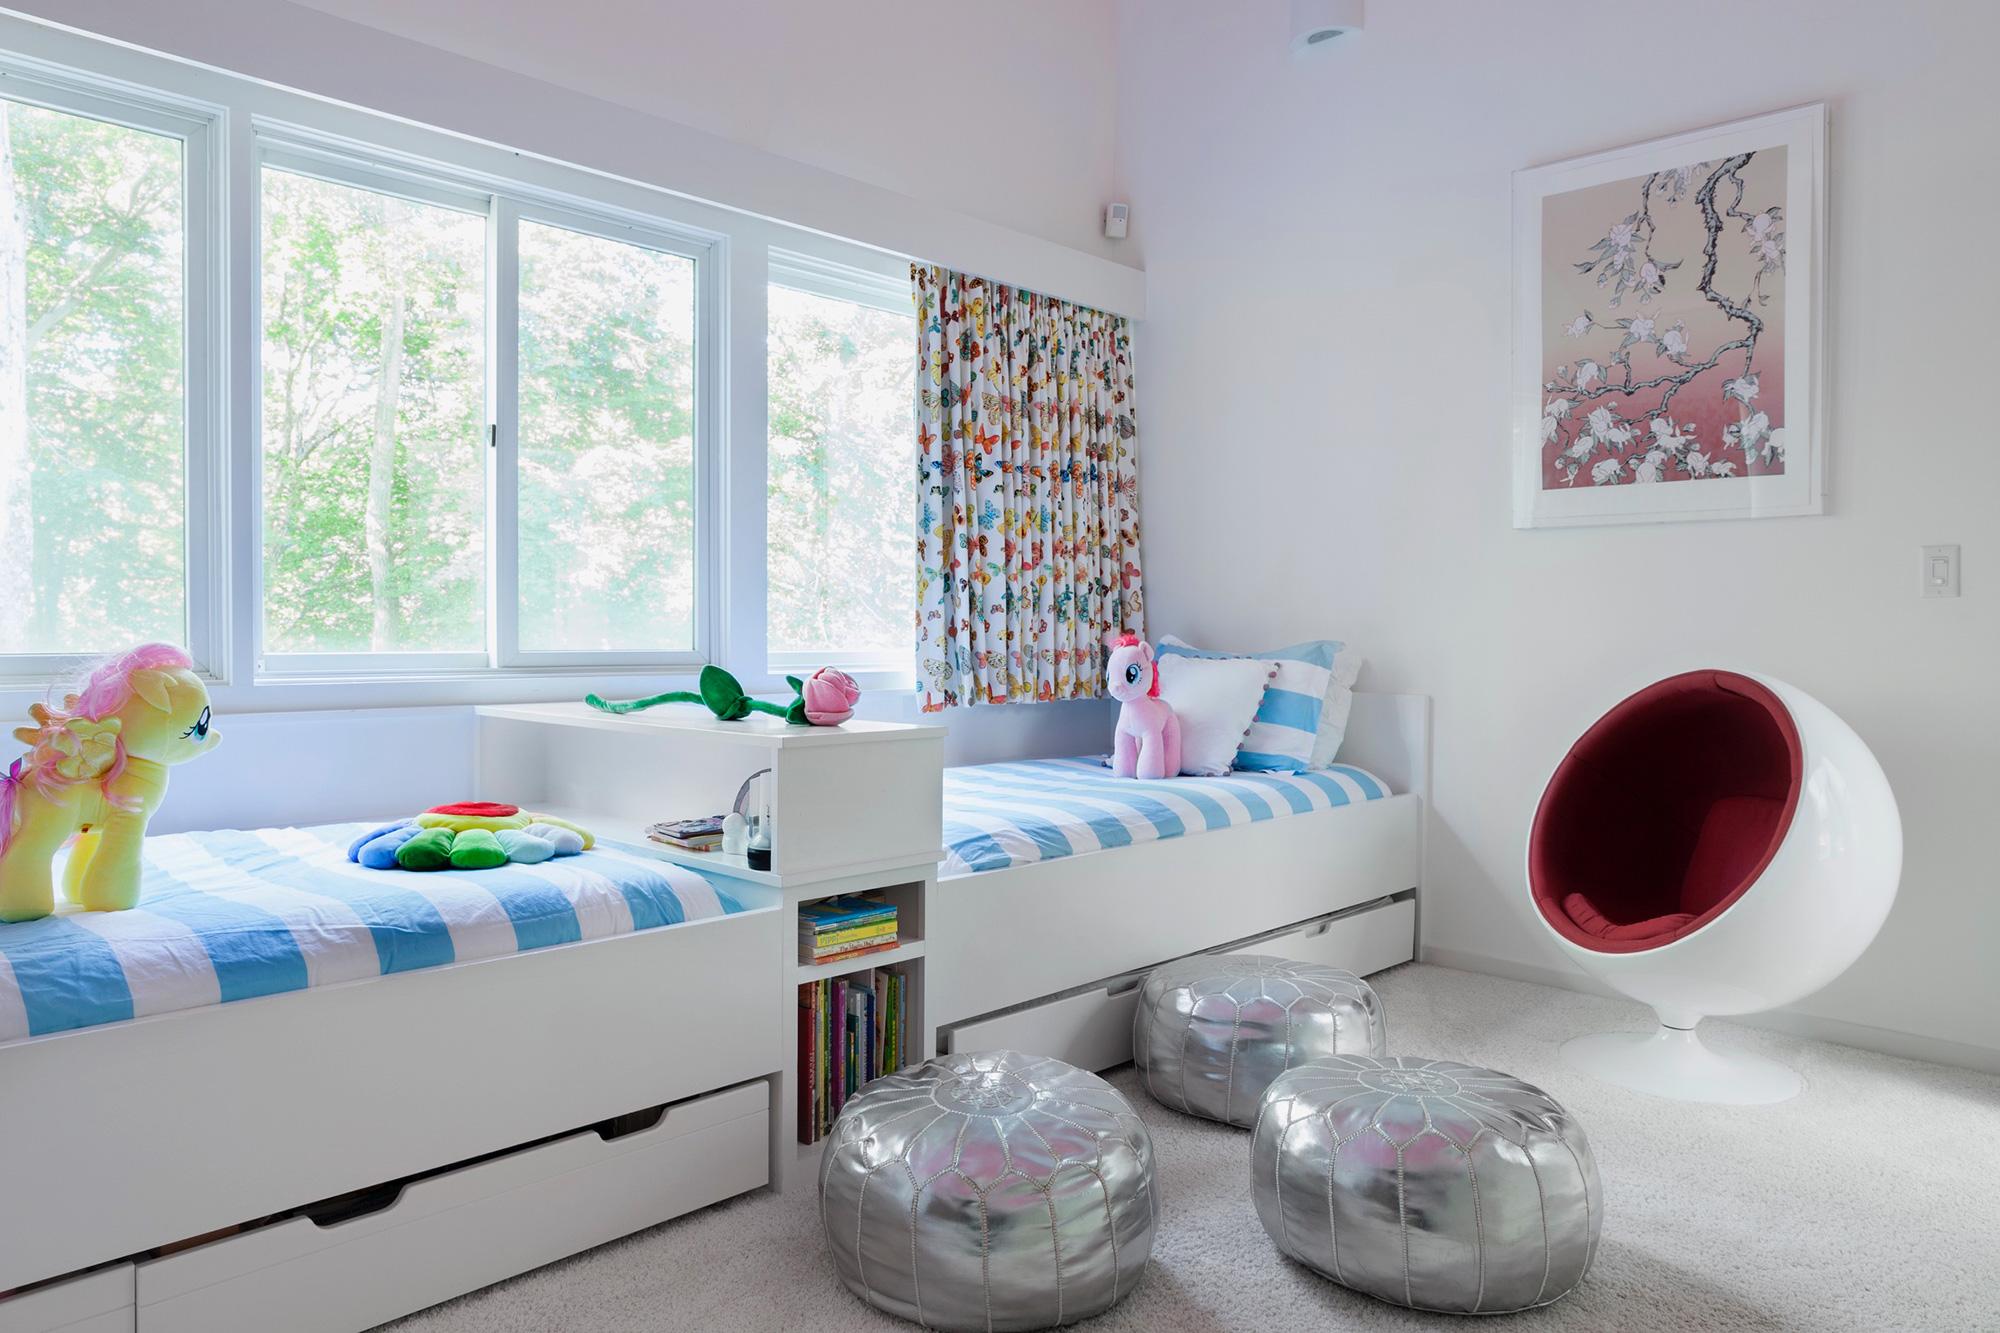 interiors-kids-are-people-new-9.jpg